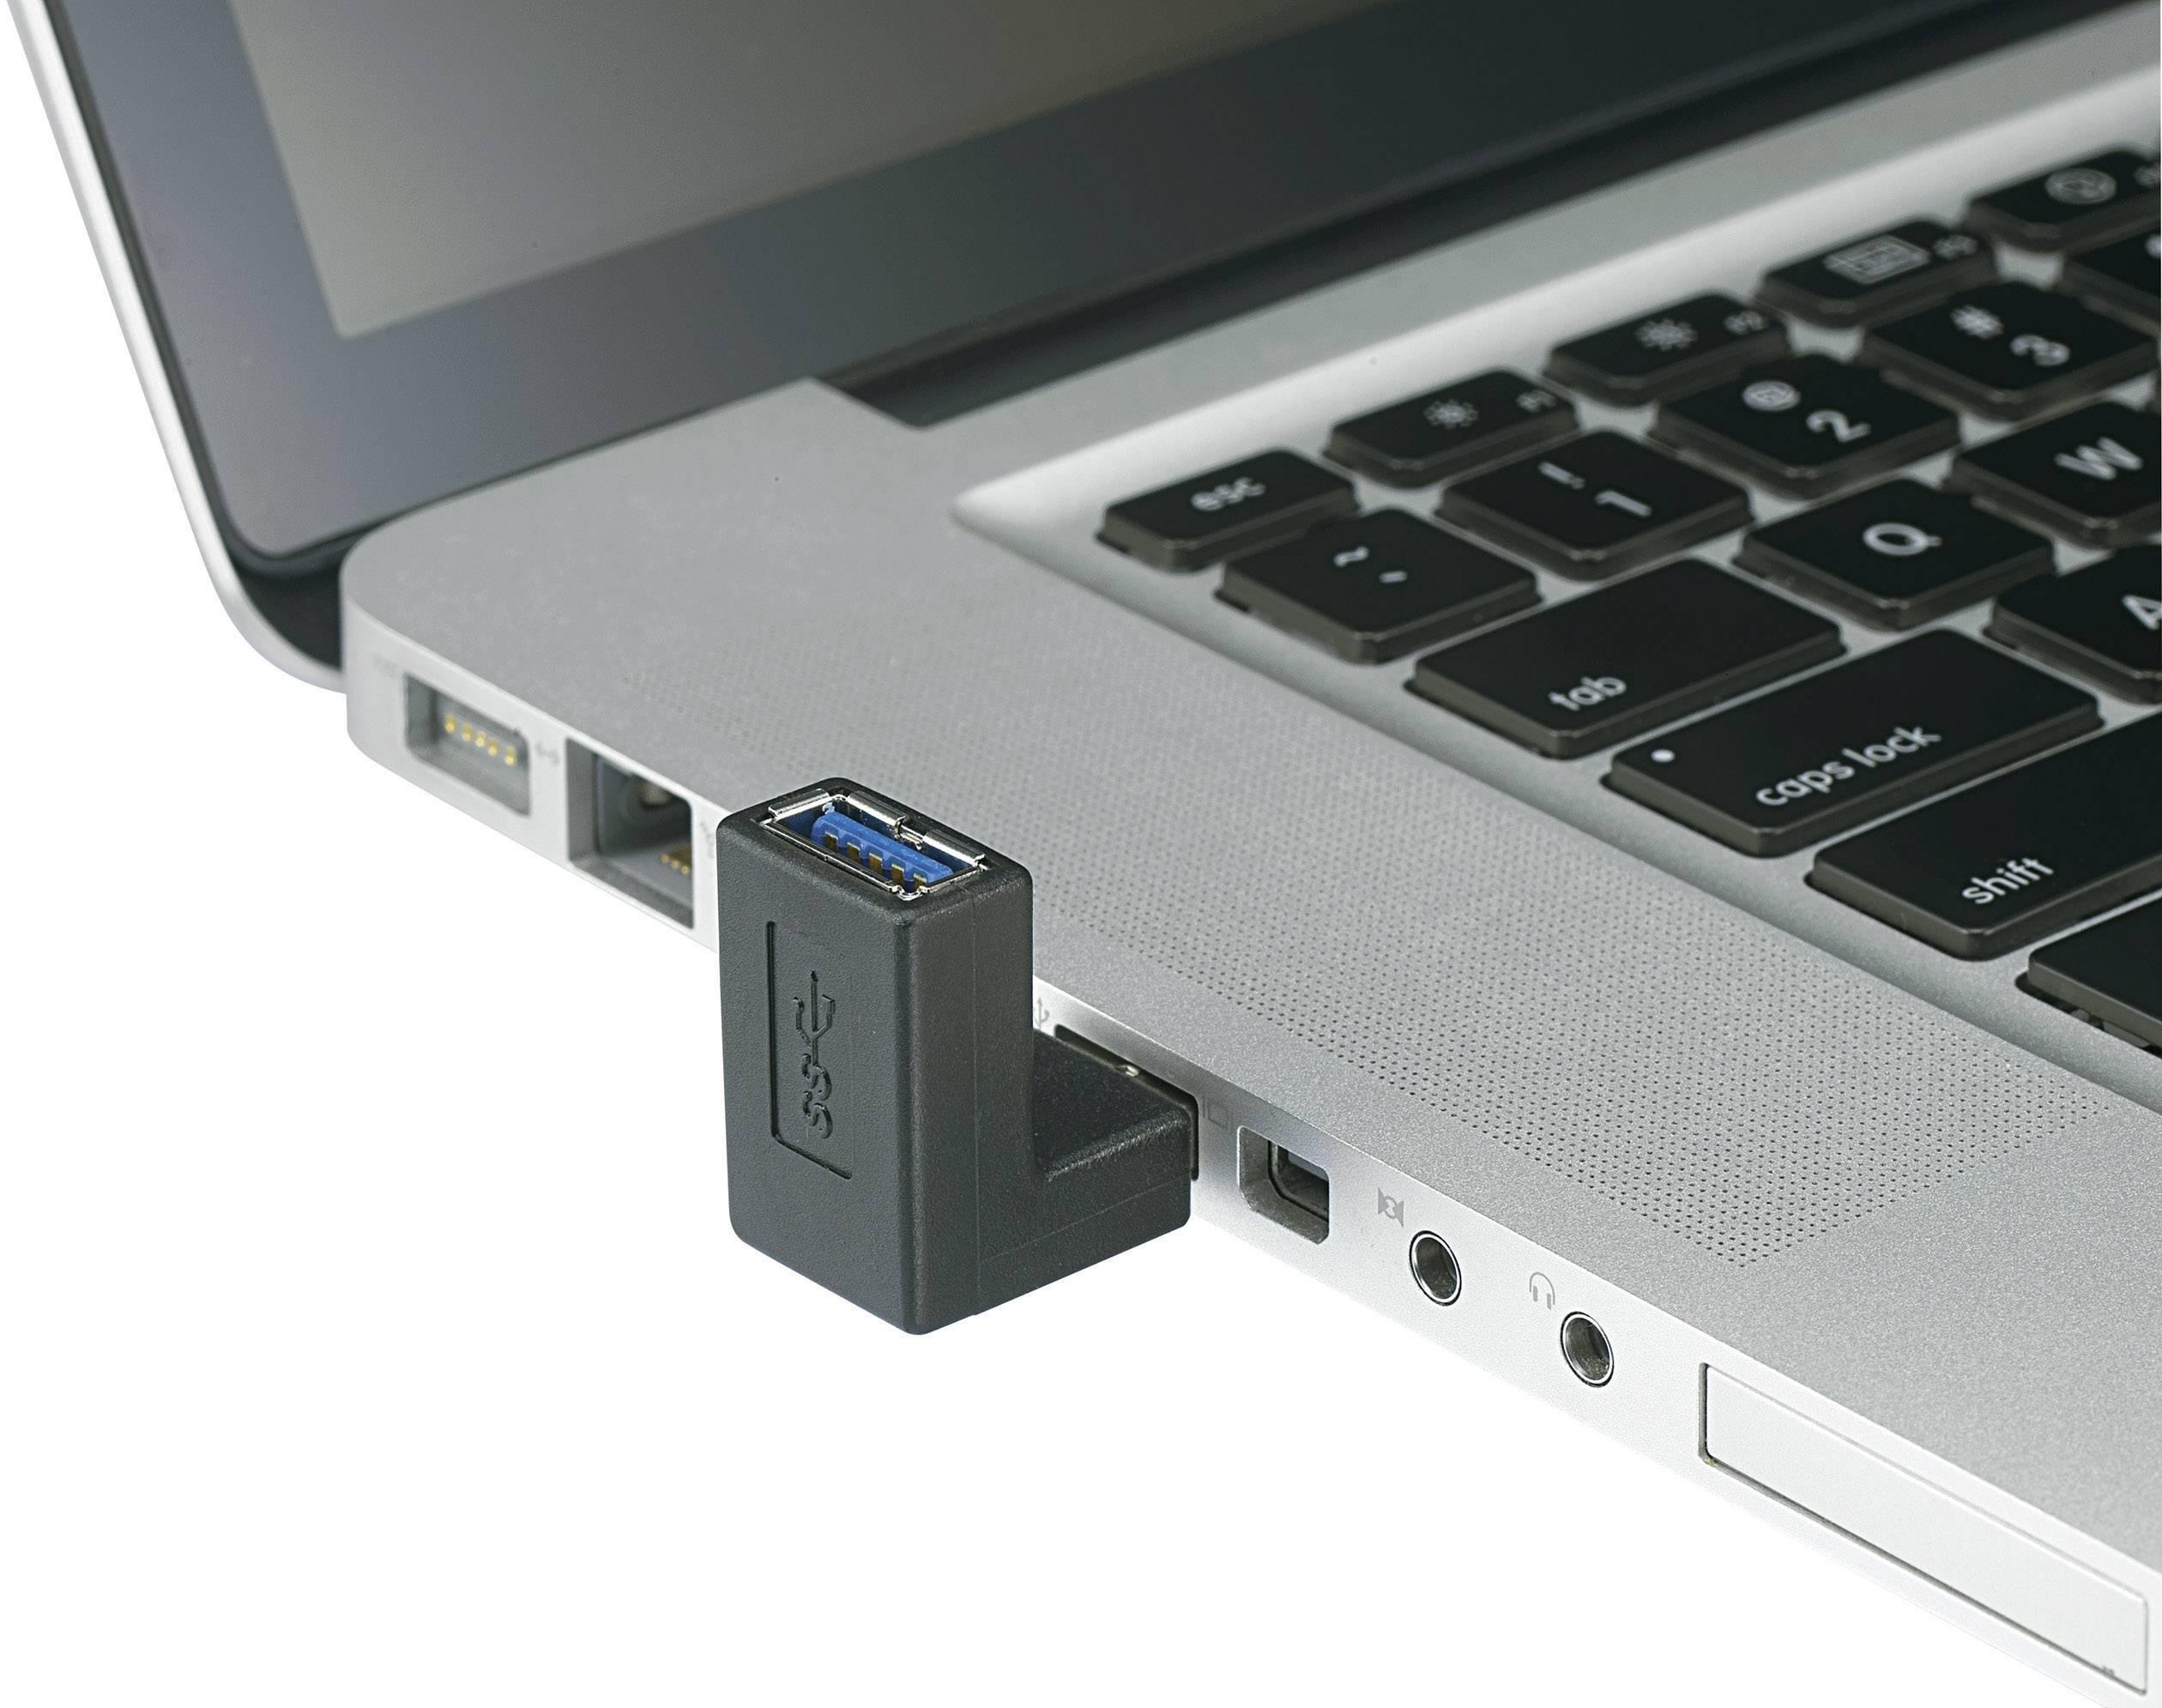 USB adaptér Renkforce 1x USB 3.0 zástrčka ⇔ 1x USB 3.0 zásuvka, černá